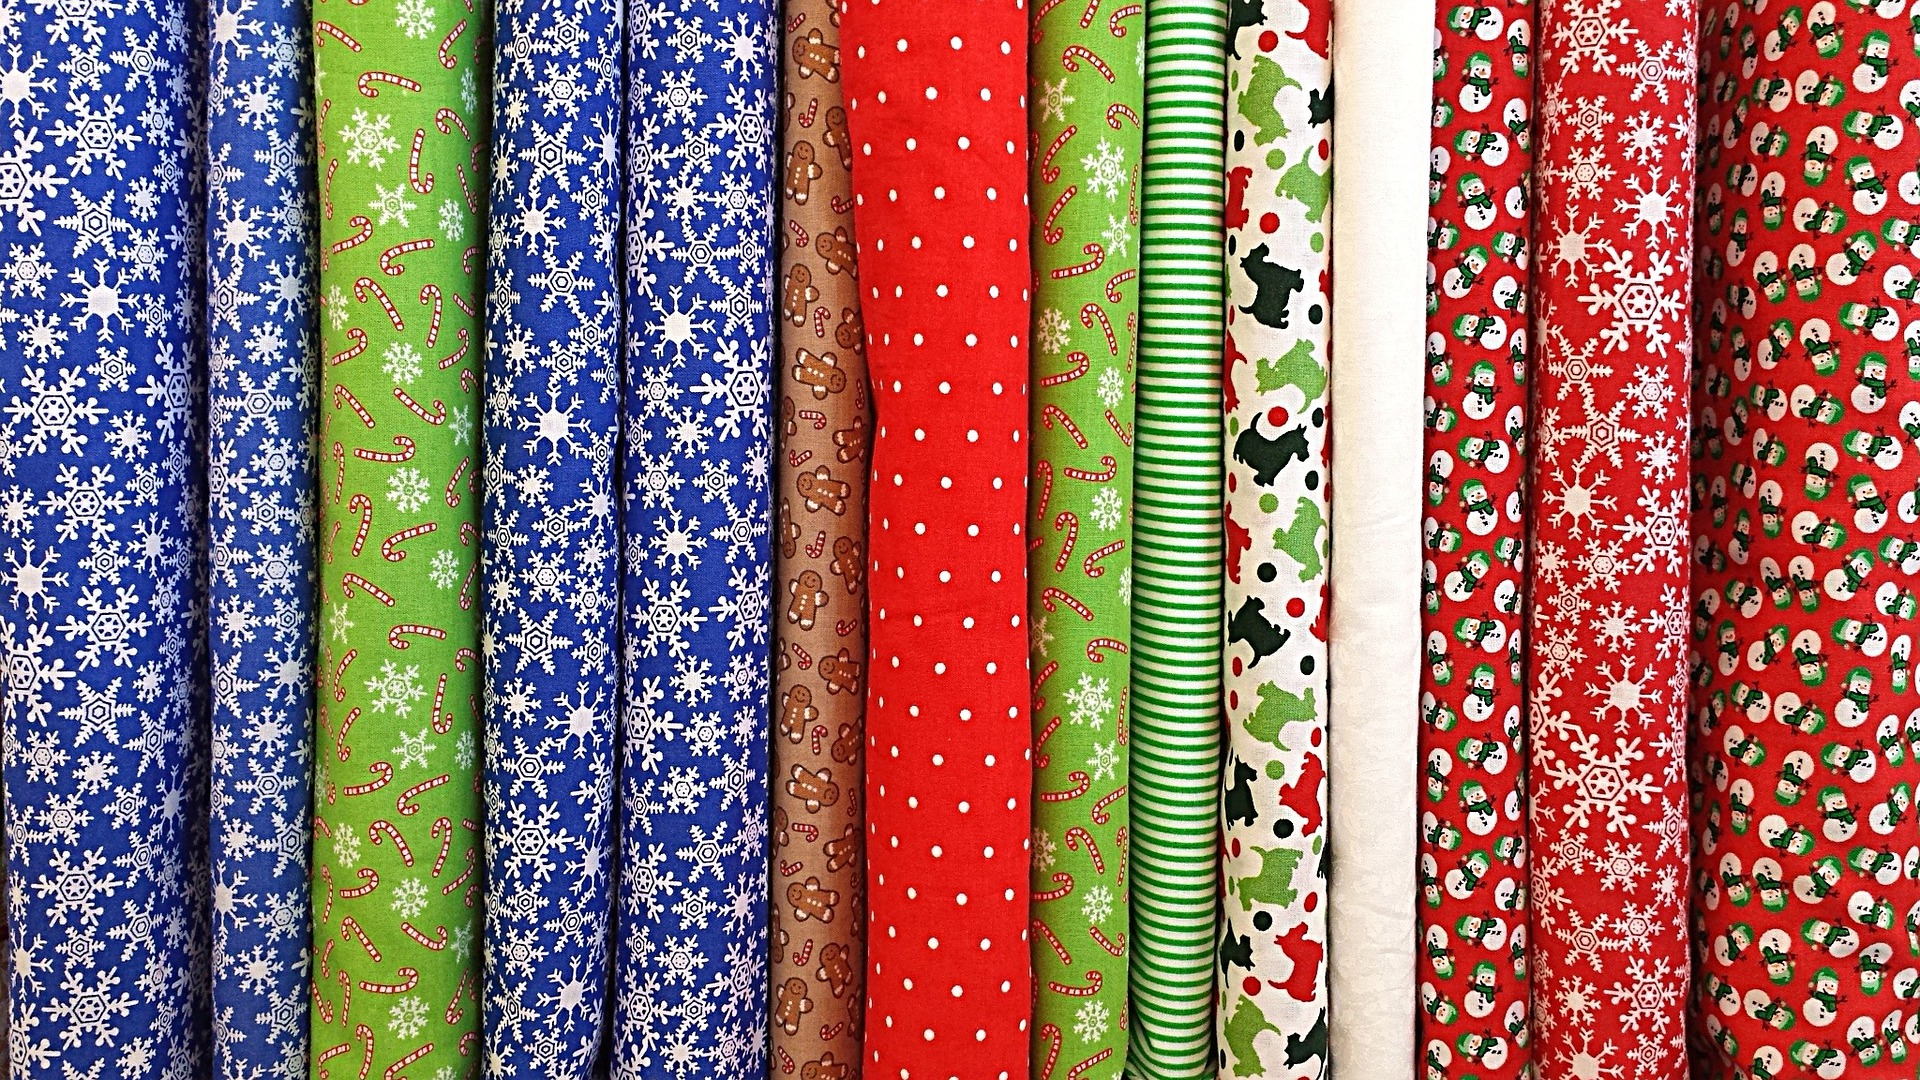 fabric-657001_1920.jpg